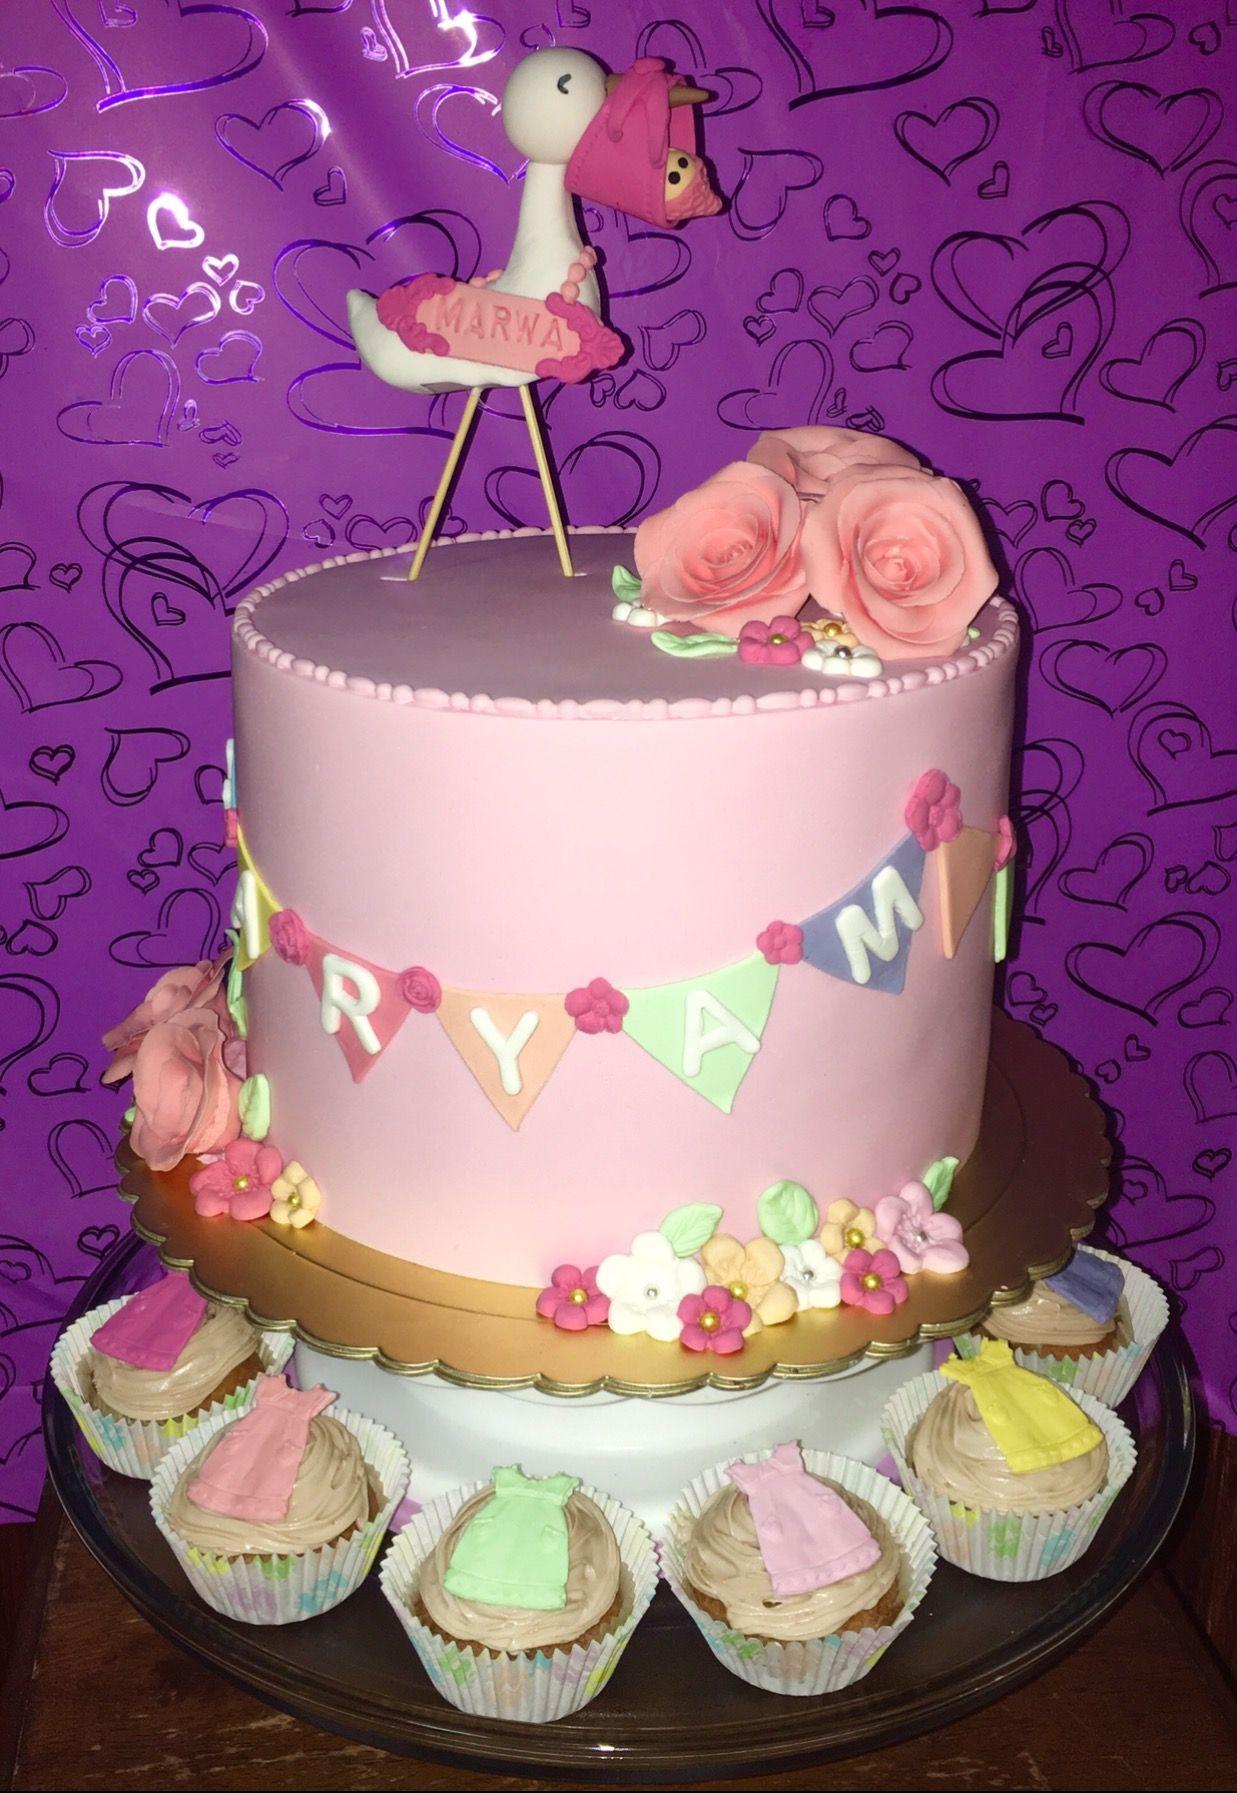 Baby cake girl cake art baby cake girl cakes